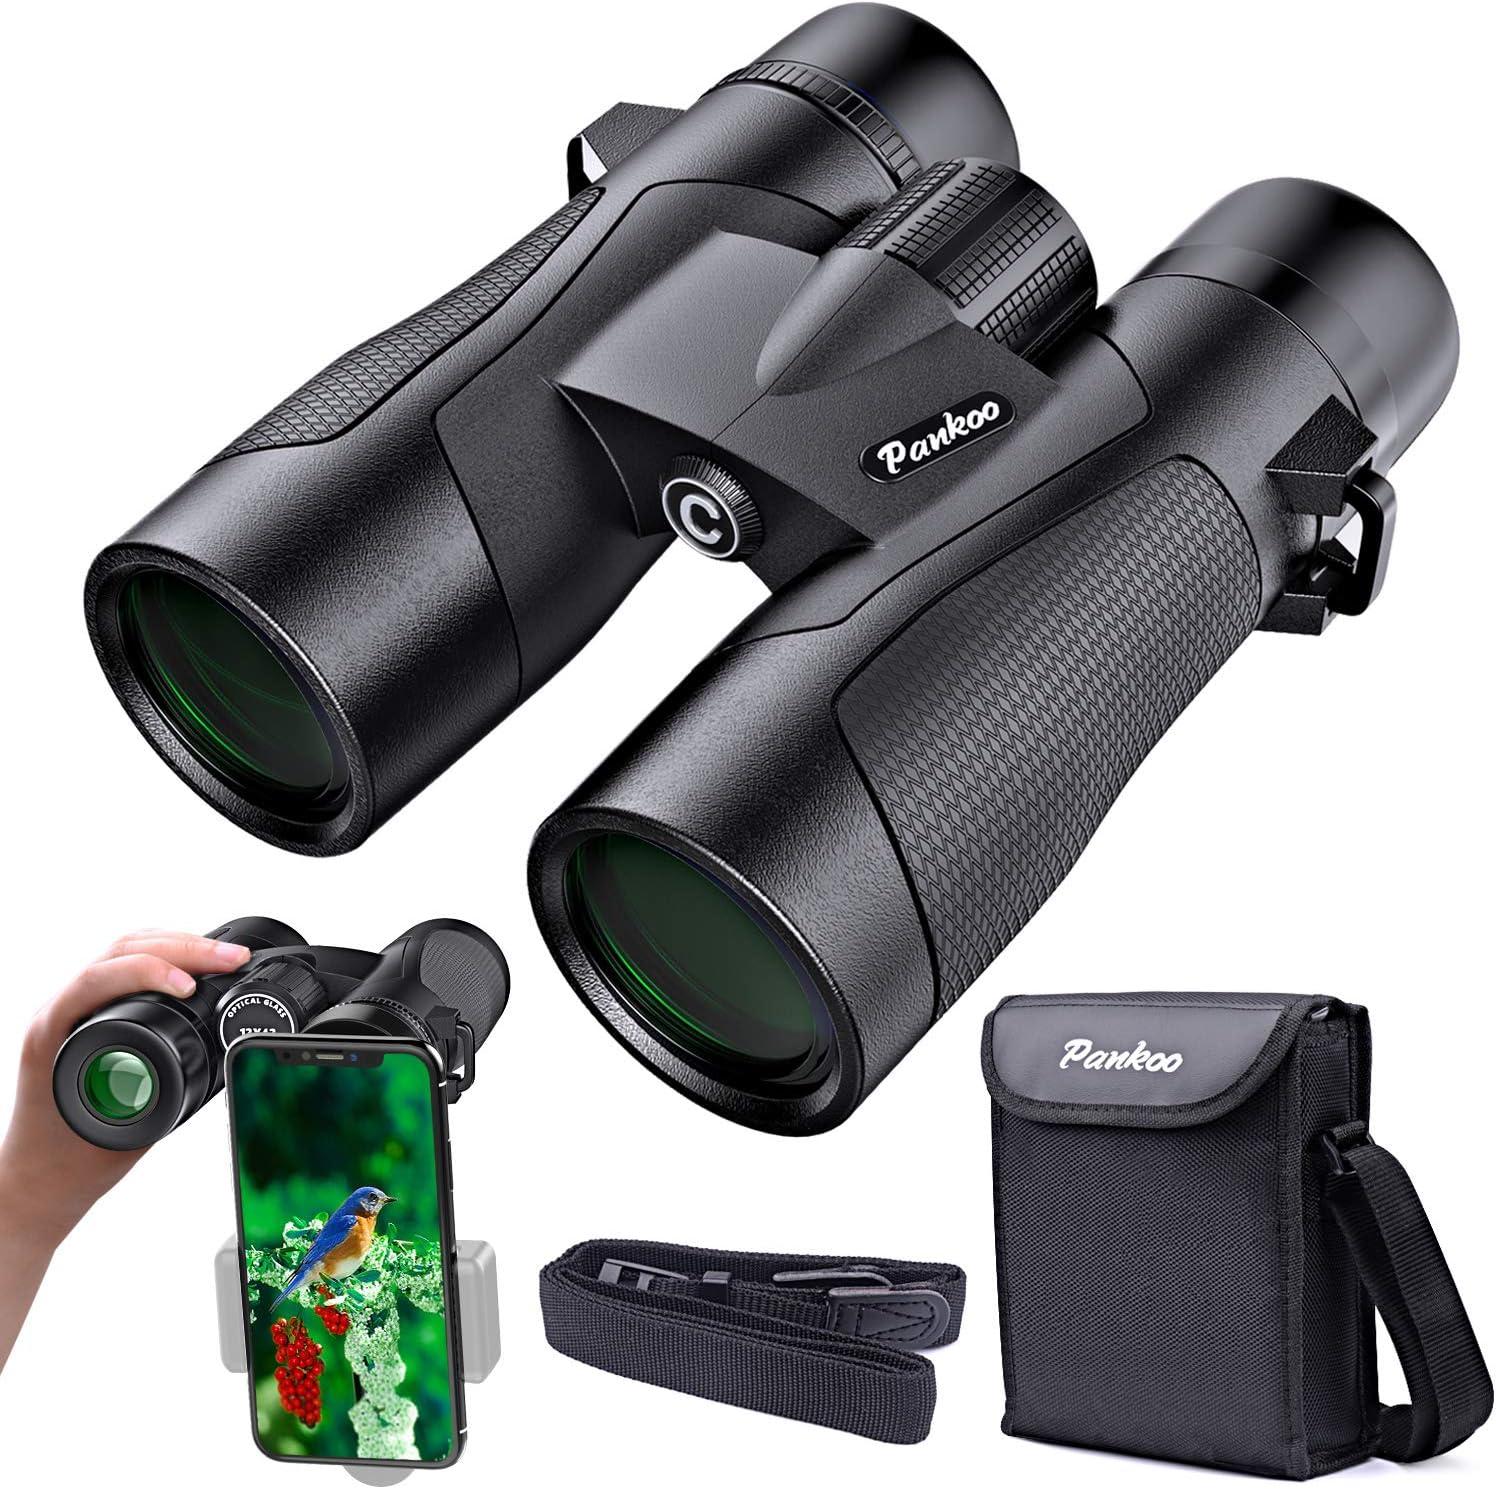 12x42 Binoculars for Adults-Pankoo HD Binocular for Bird Watching Travel Hiking Wildlife Hunting Concerts Theater-Waterproof Low Night Vision Lightweight-Compact-Binoculars-for-Adults